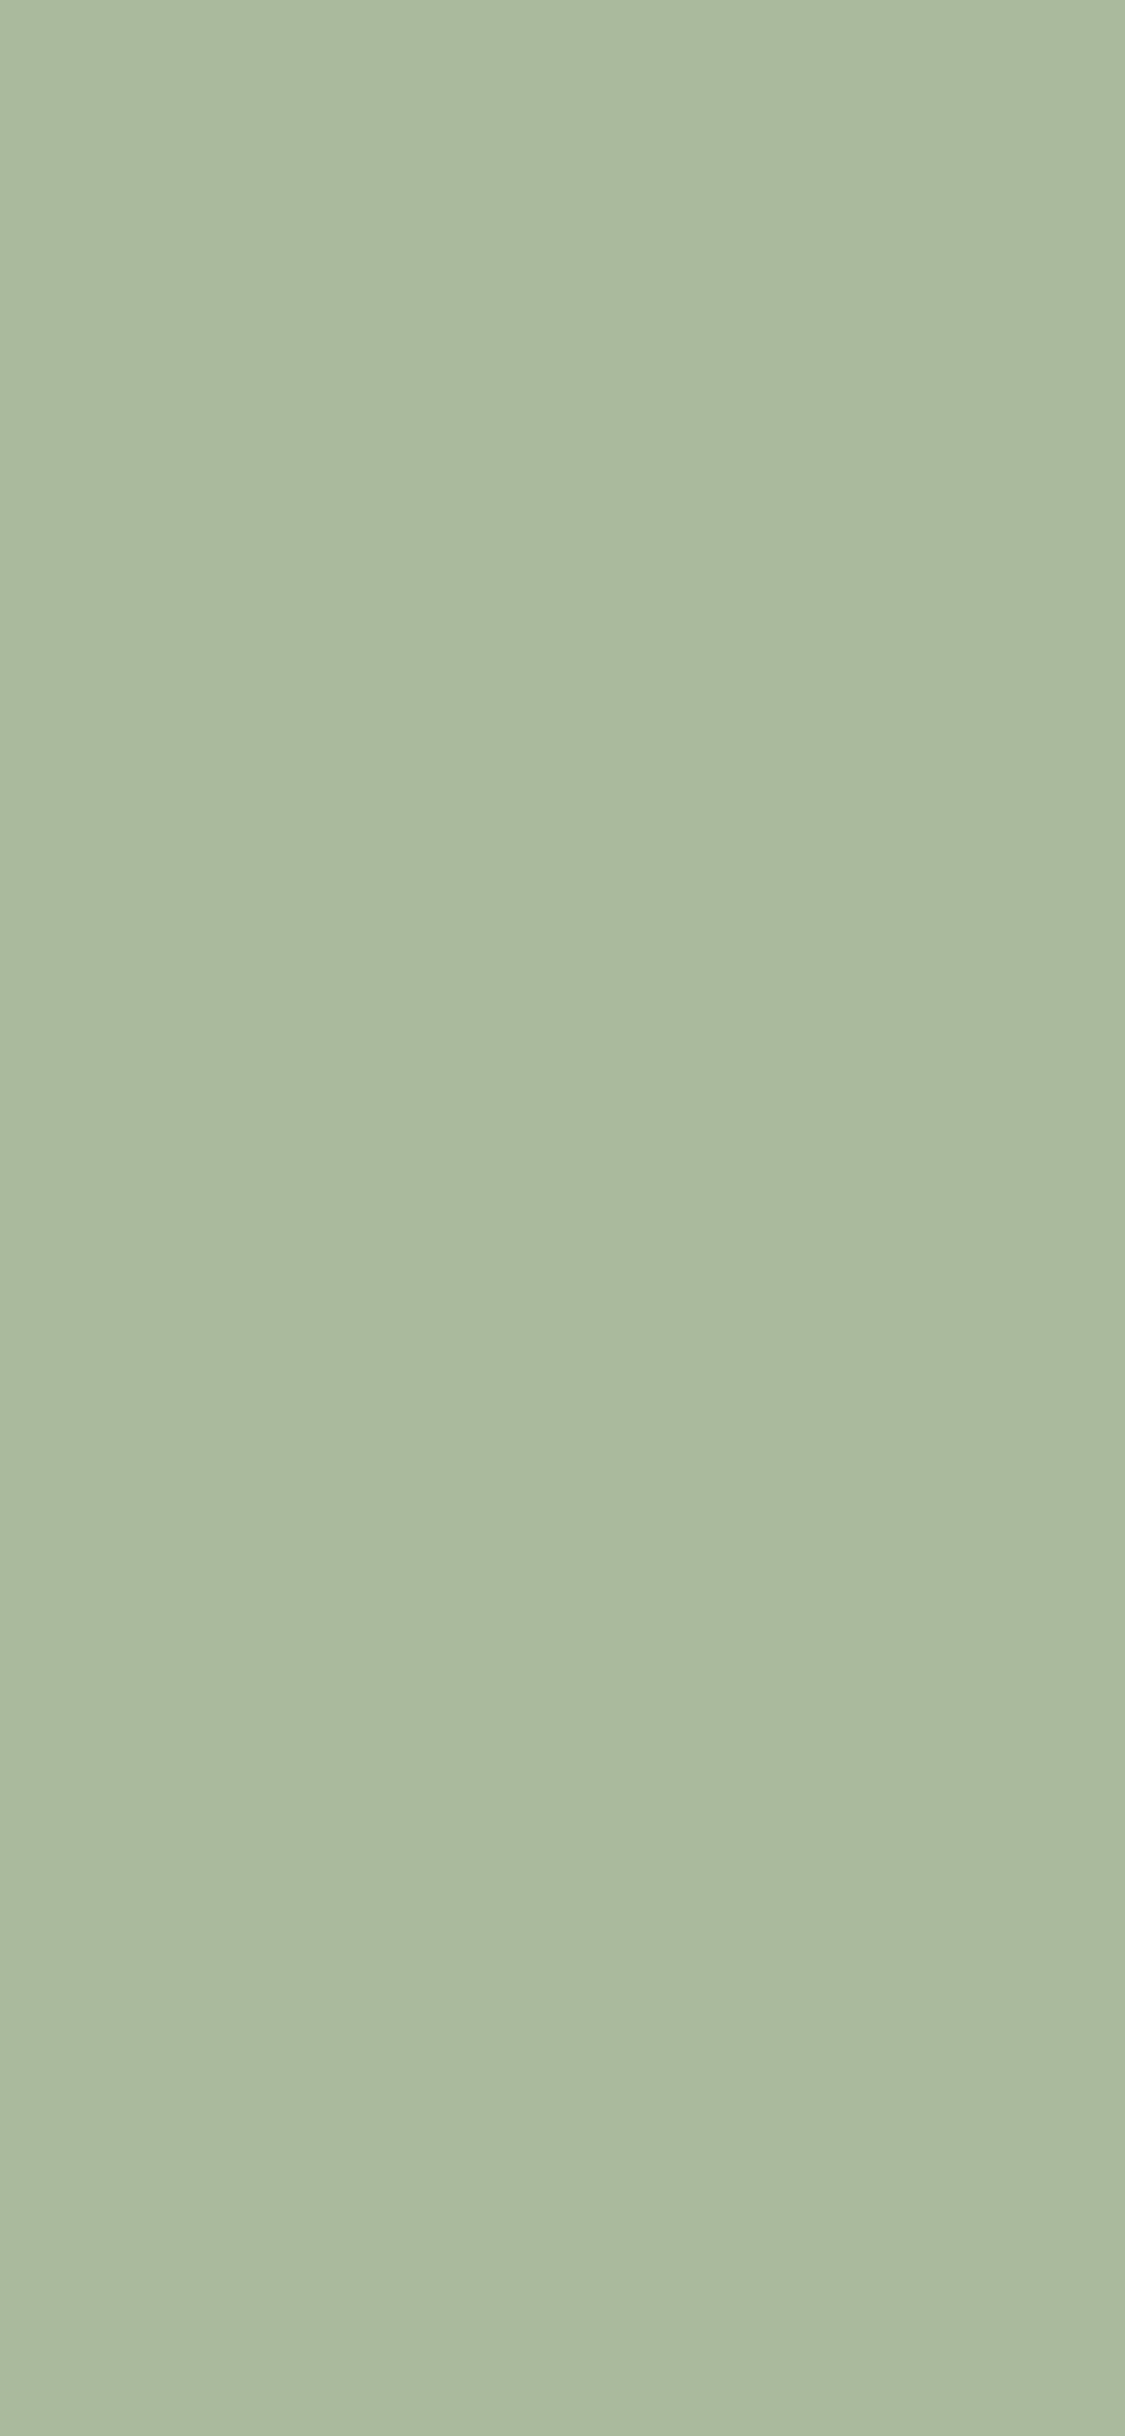 1125x2436 Laurel Green Solid Color Background